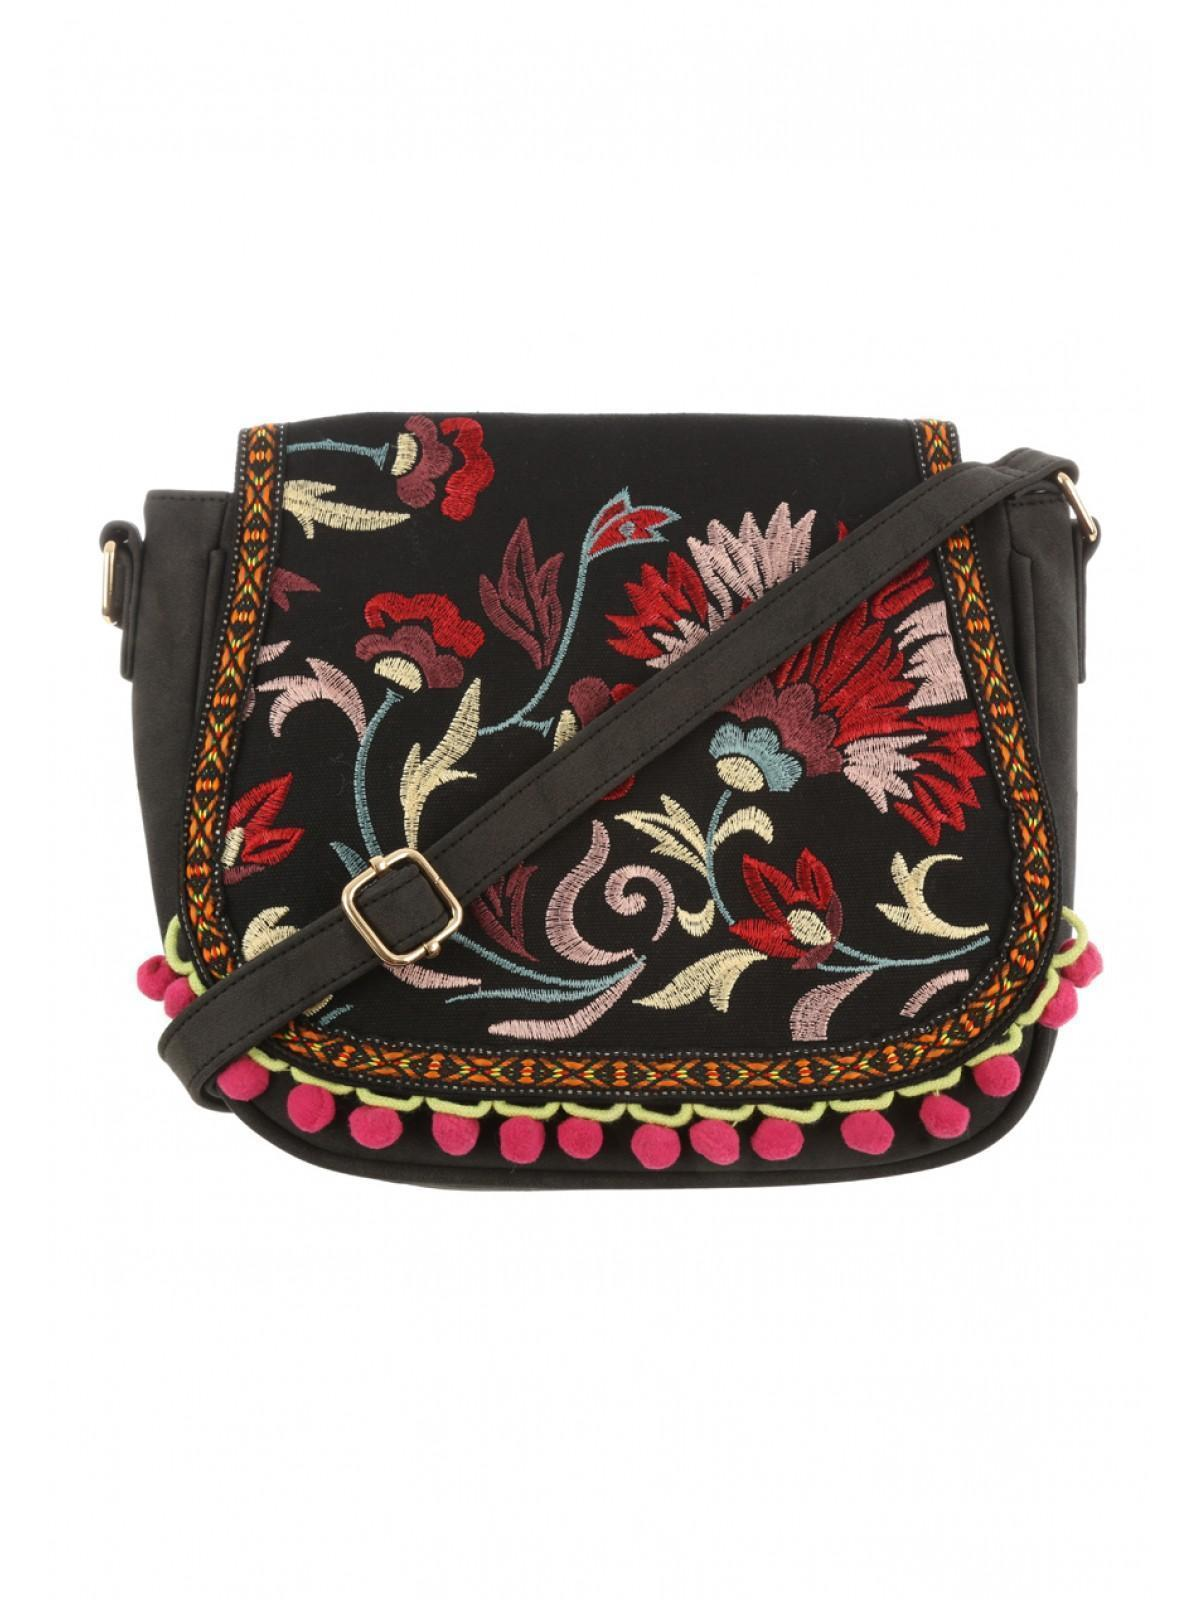 Goshico embroidered tote/shoulder bag FOLK ART http://mybags.co.